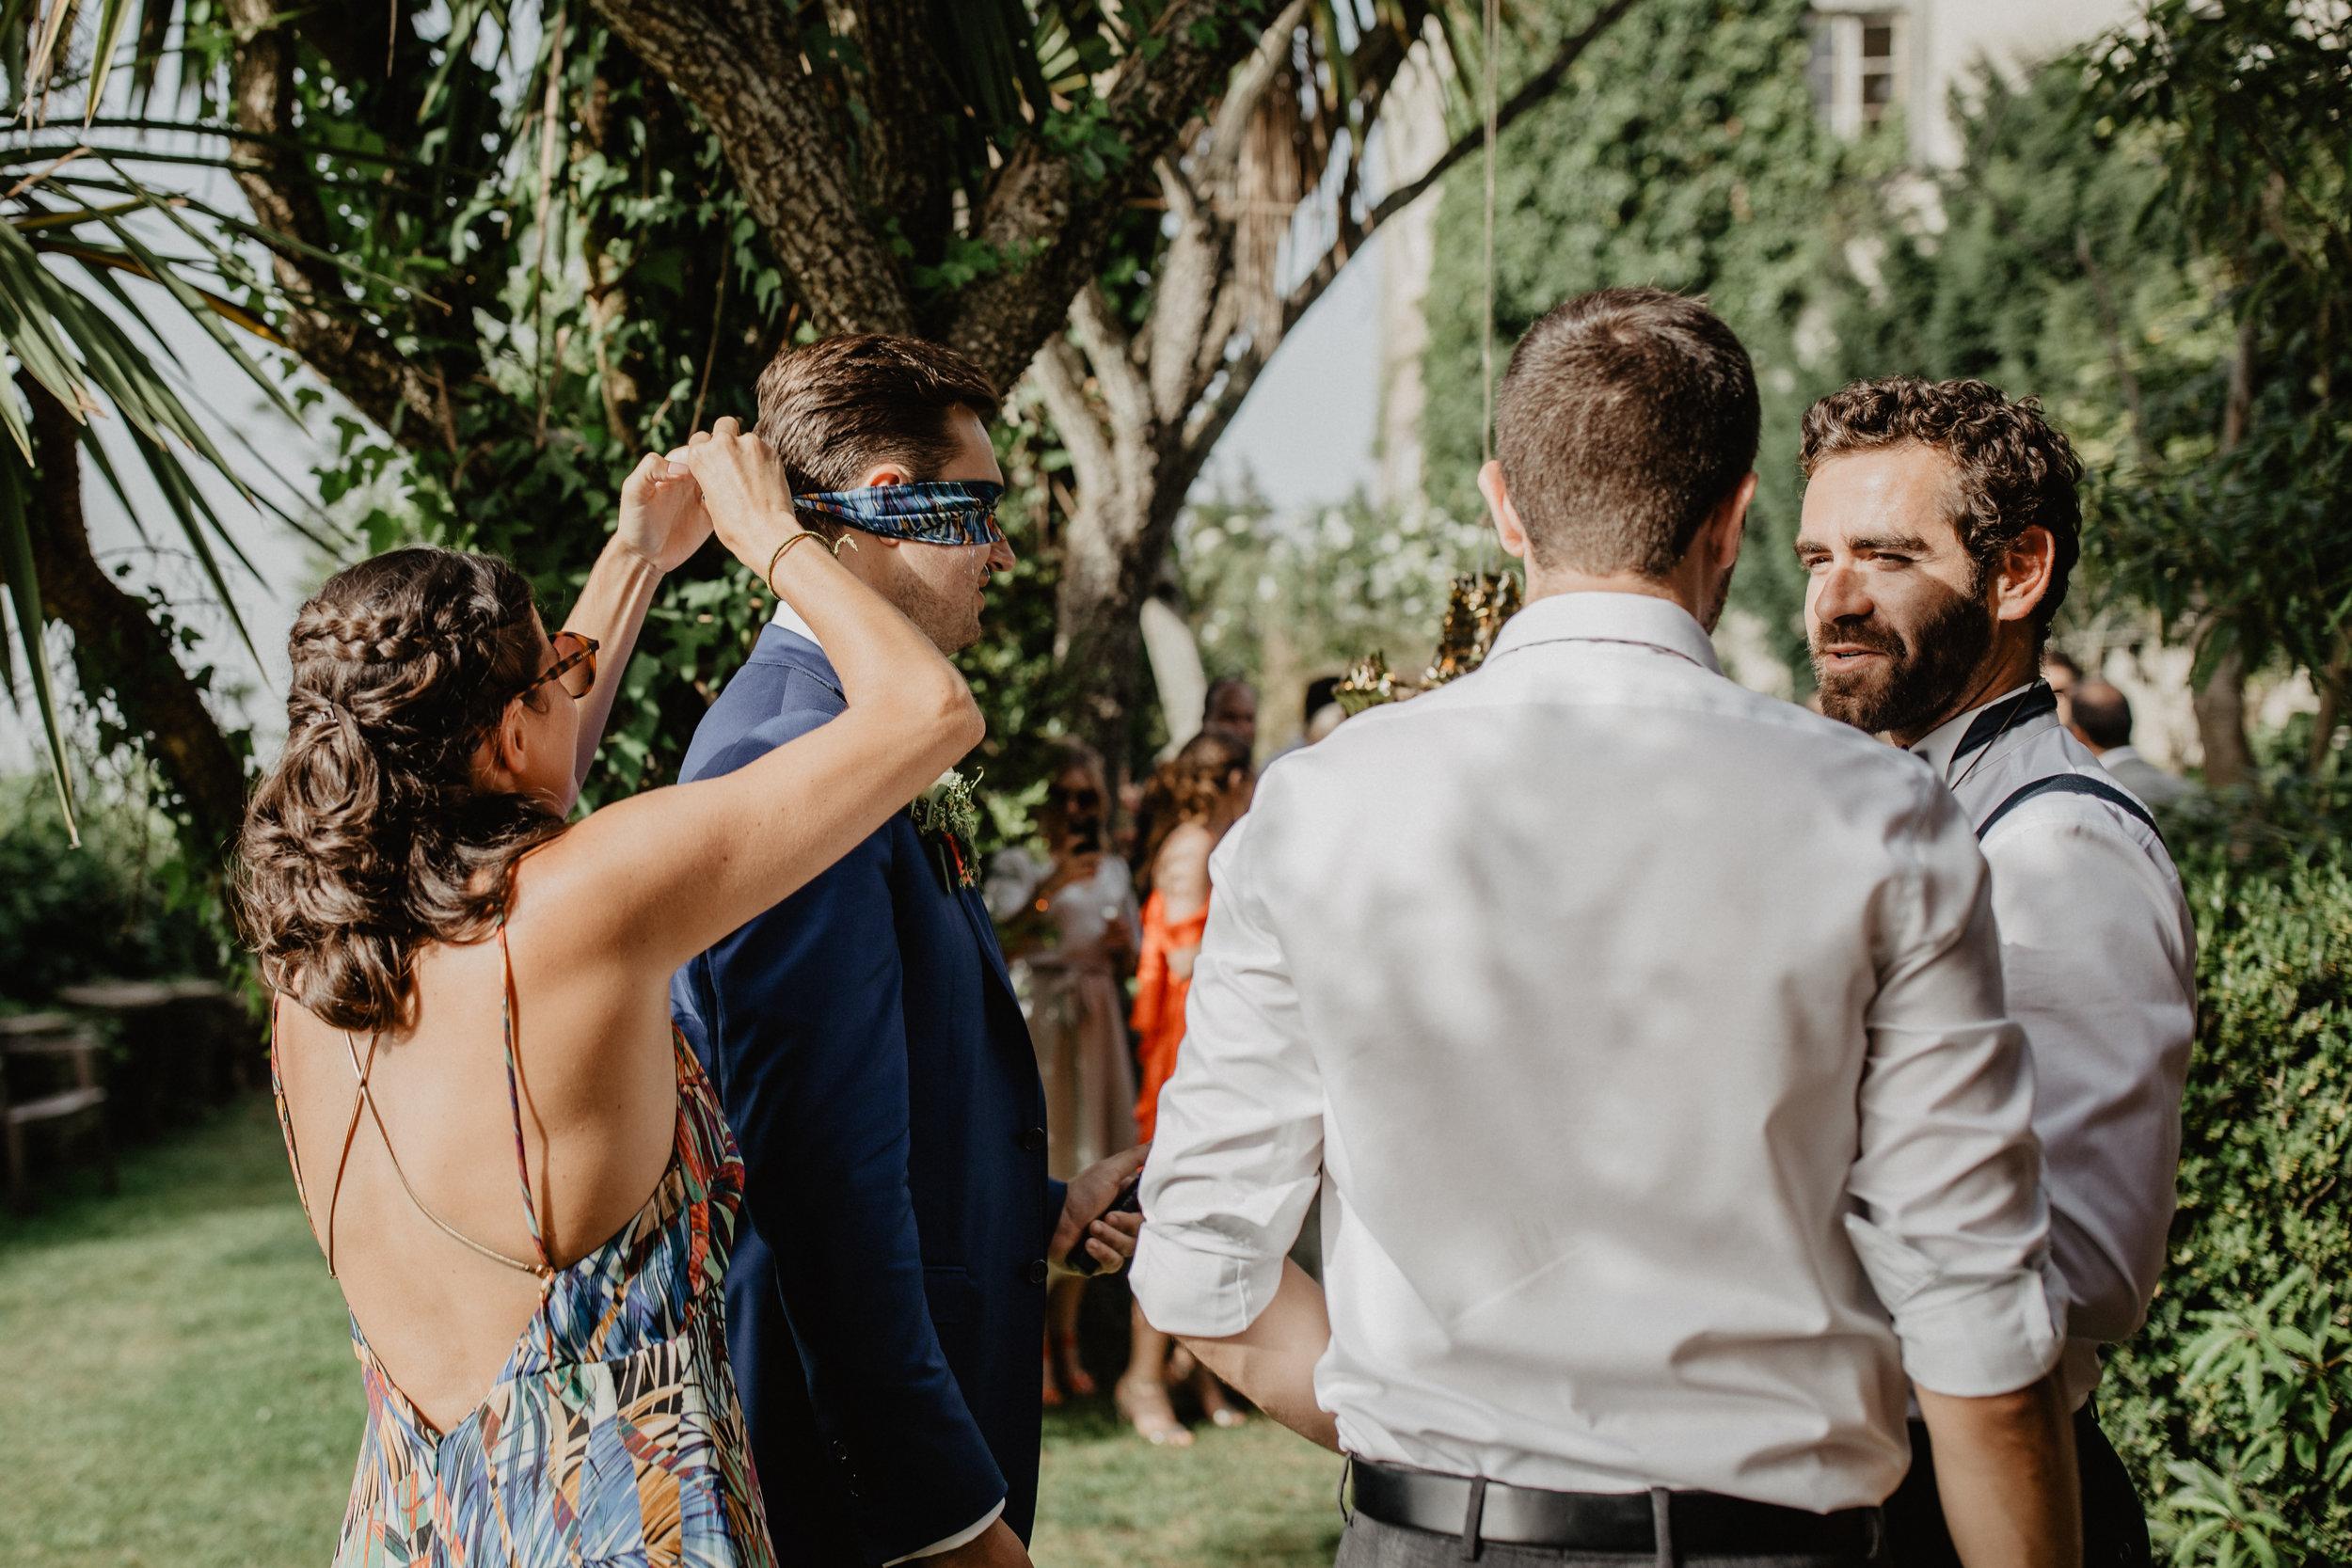 Lapela-photography-wedding-sintra-portugal-84.jpg